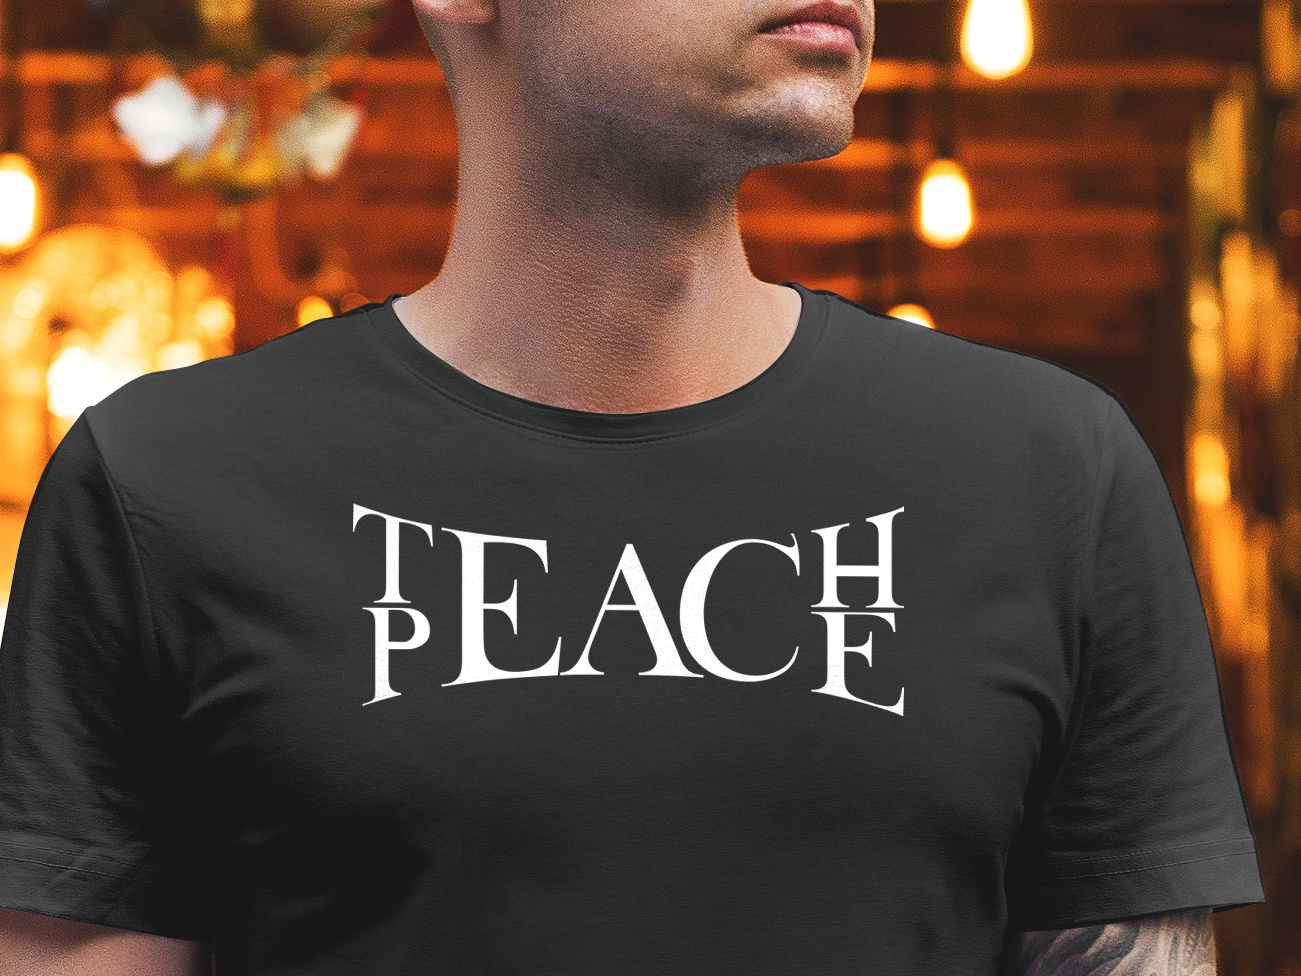 TeacH PeacE serifs tshirt graphics concept art design typography